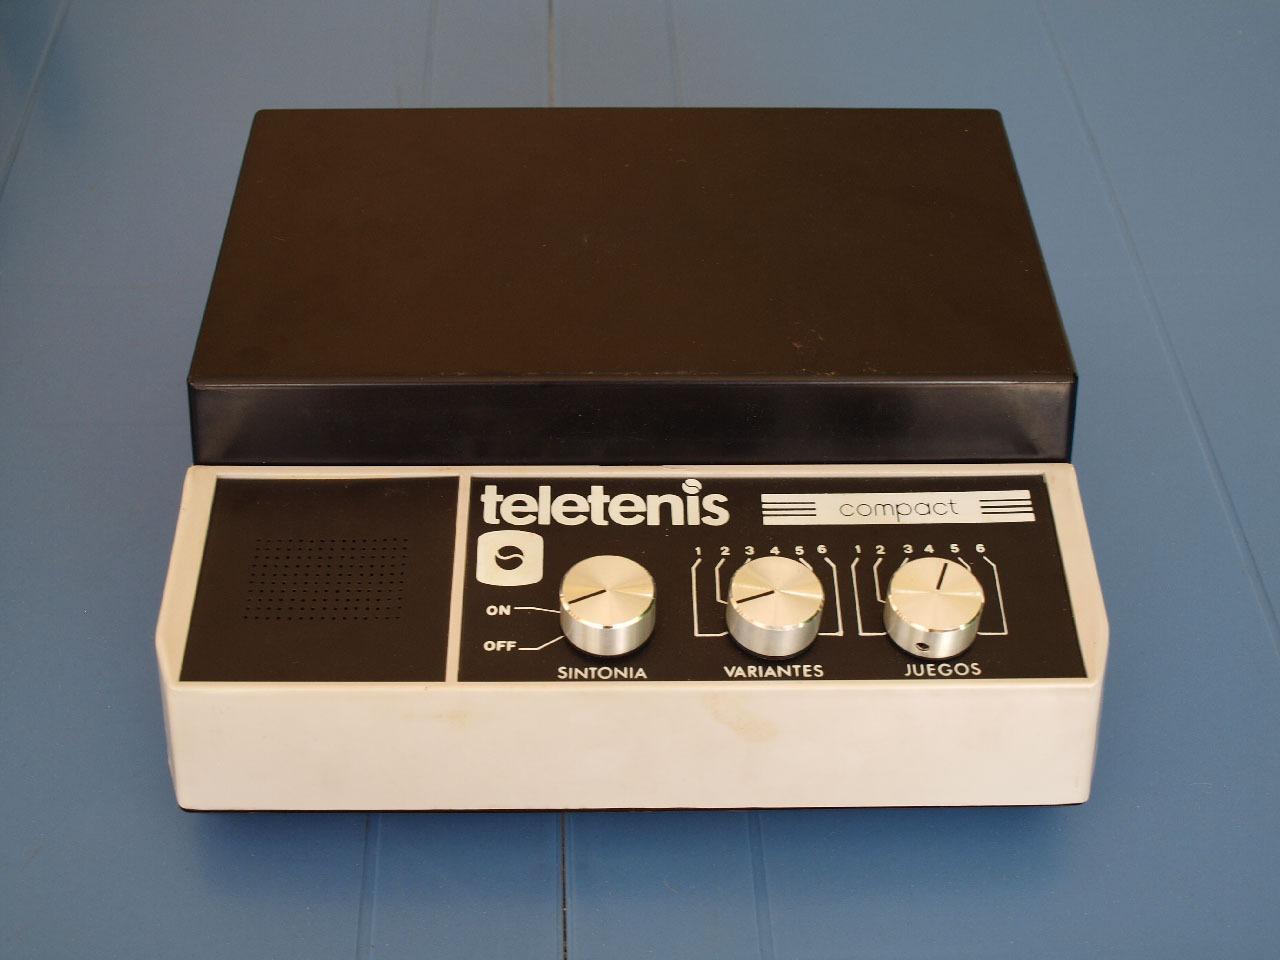 Teletenis Compact, retrounboxing y gameplay 3